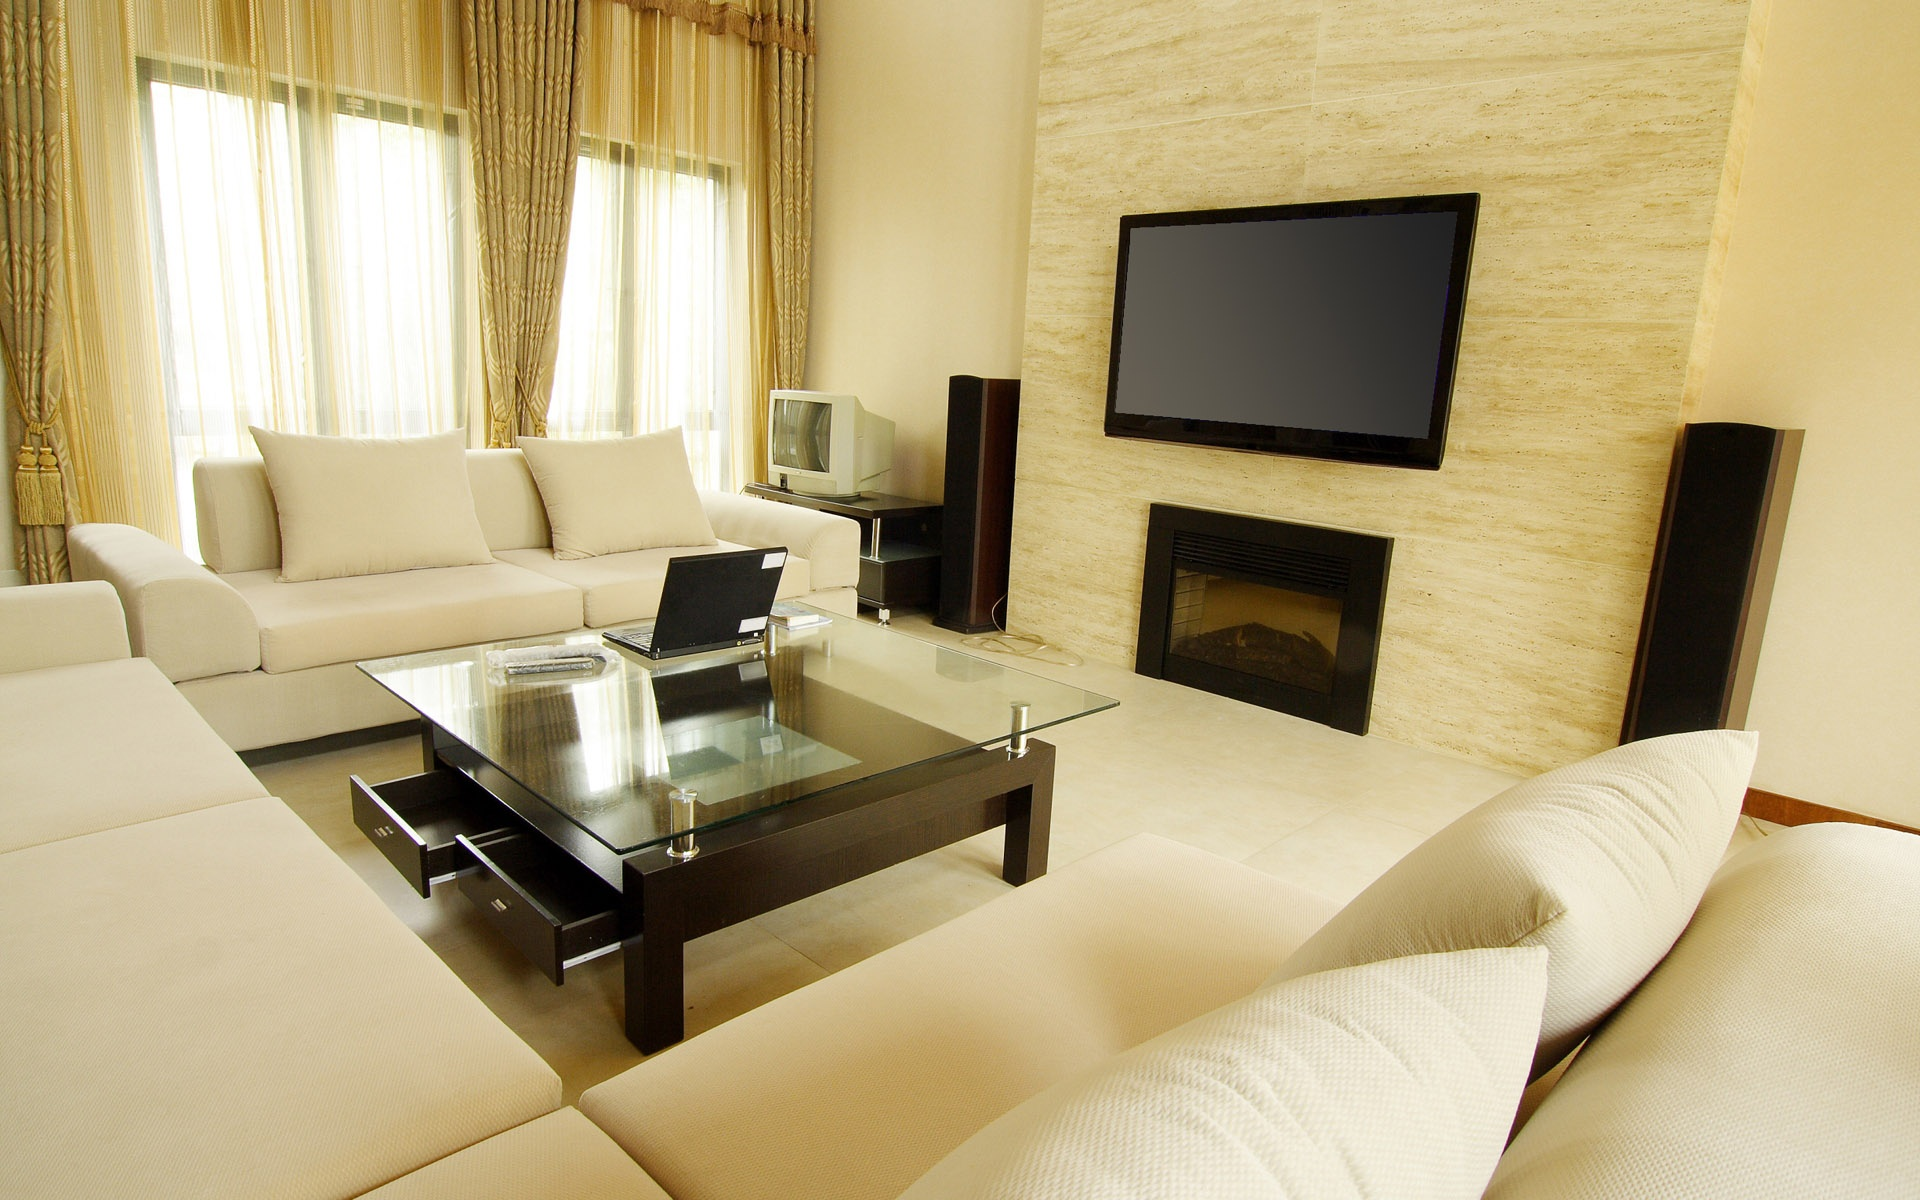 wallpapers for living room images,room,property,interior design,living room,furniture